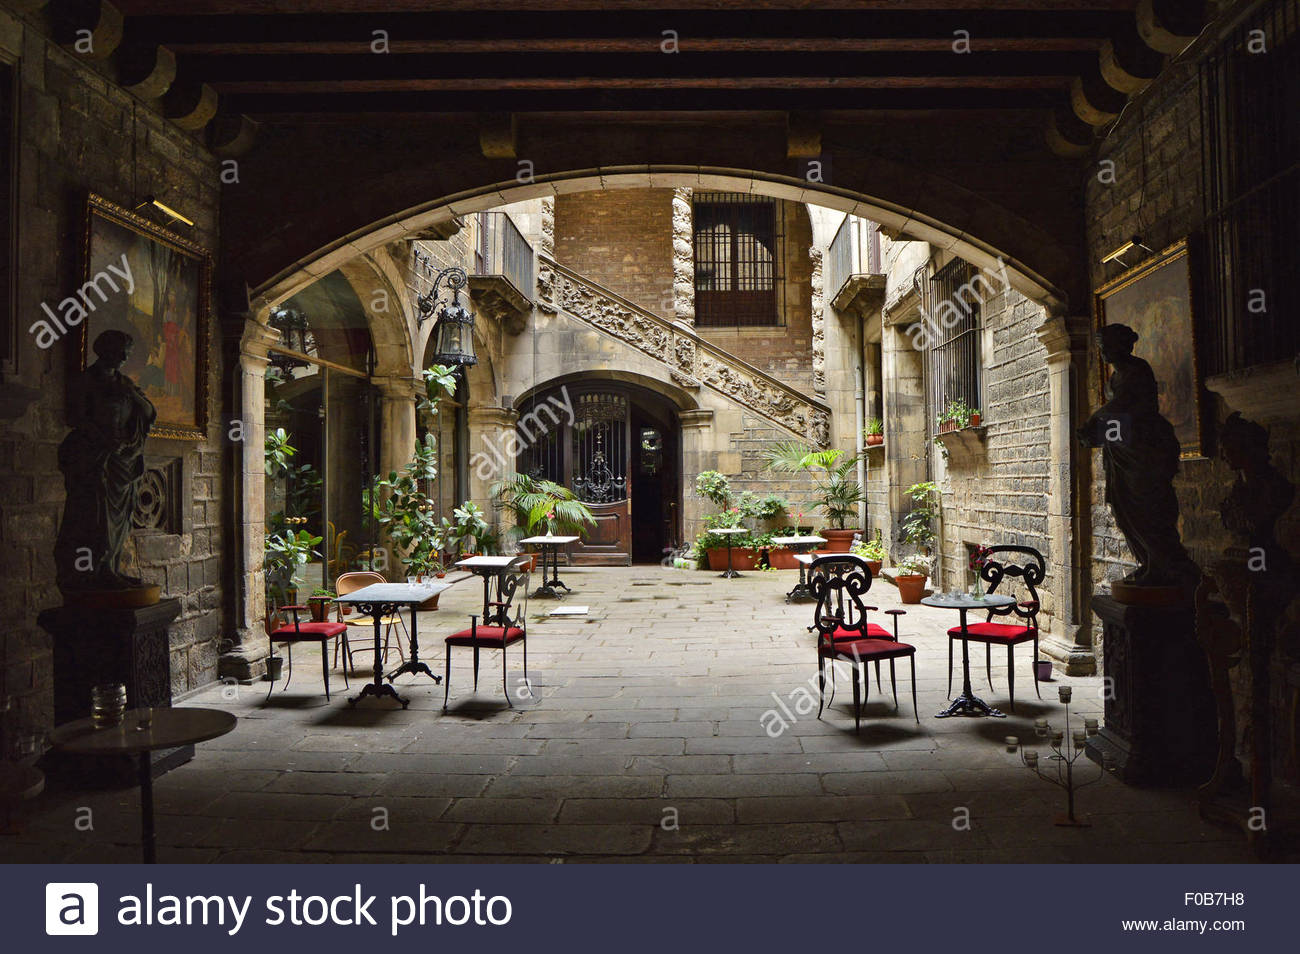 Palau Dalmases Espai Barroc - historic palace restaurant archway entrance, El Born district Barcelona Spain Europe. - Stock Image